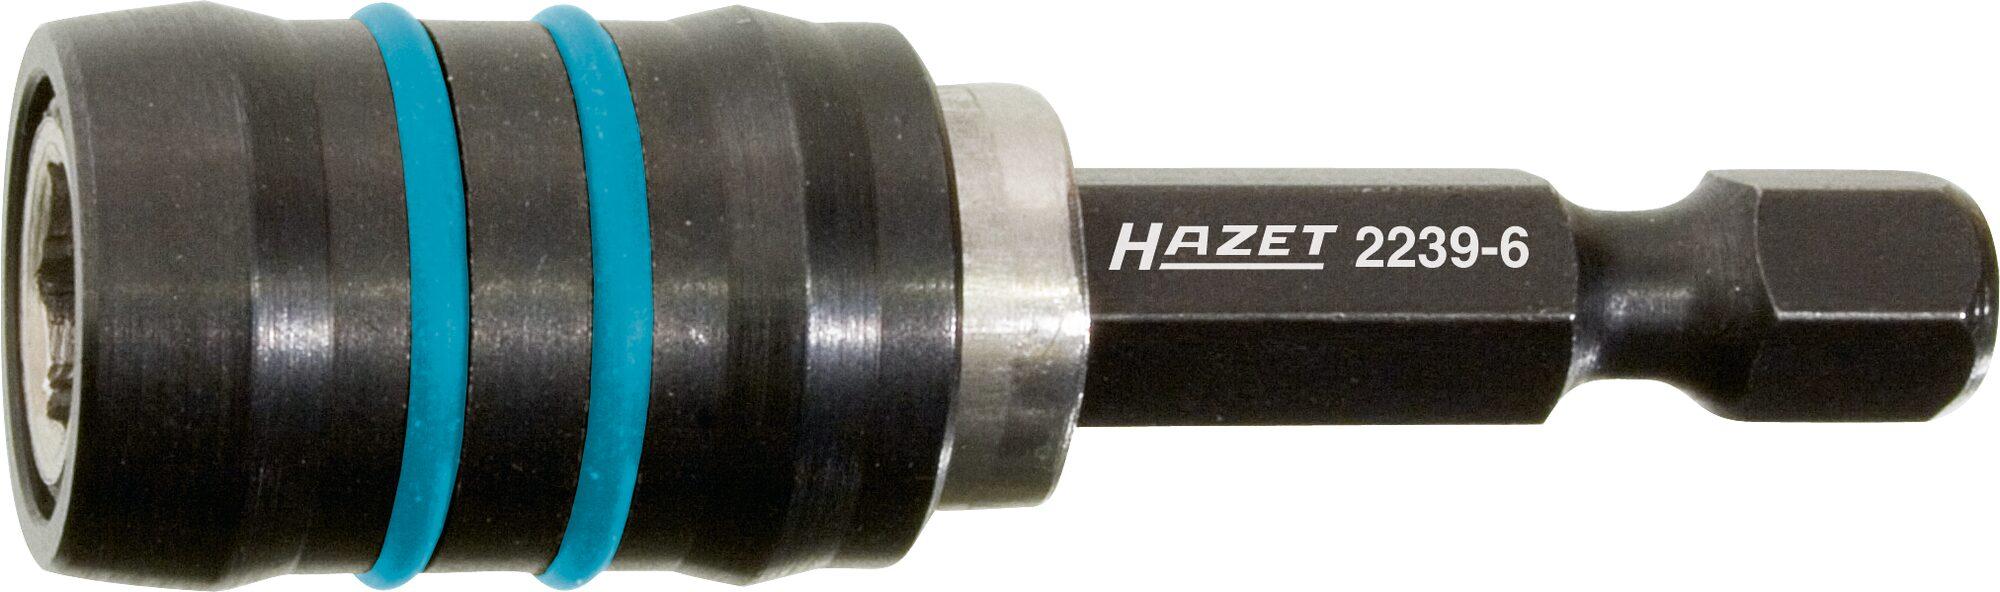 HAZET Adapter 2239-6 ∙ Sechskant massiv 6,3 (1/4 Zoll) ∙ Sechskant hohl 6,3 (1/4 Zoll)